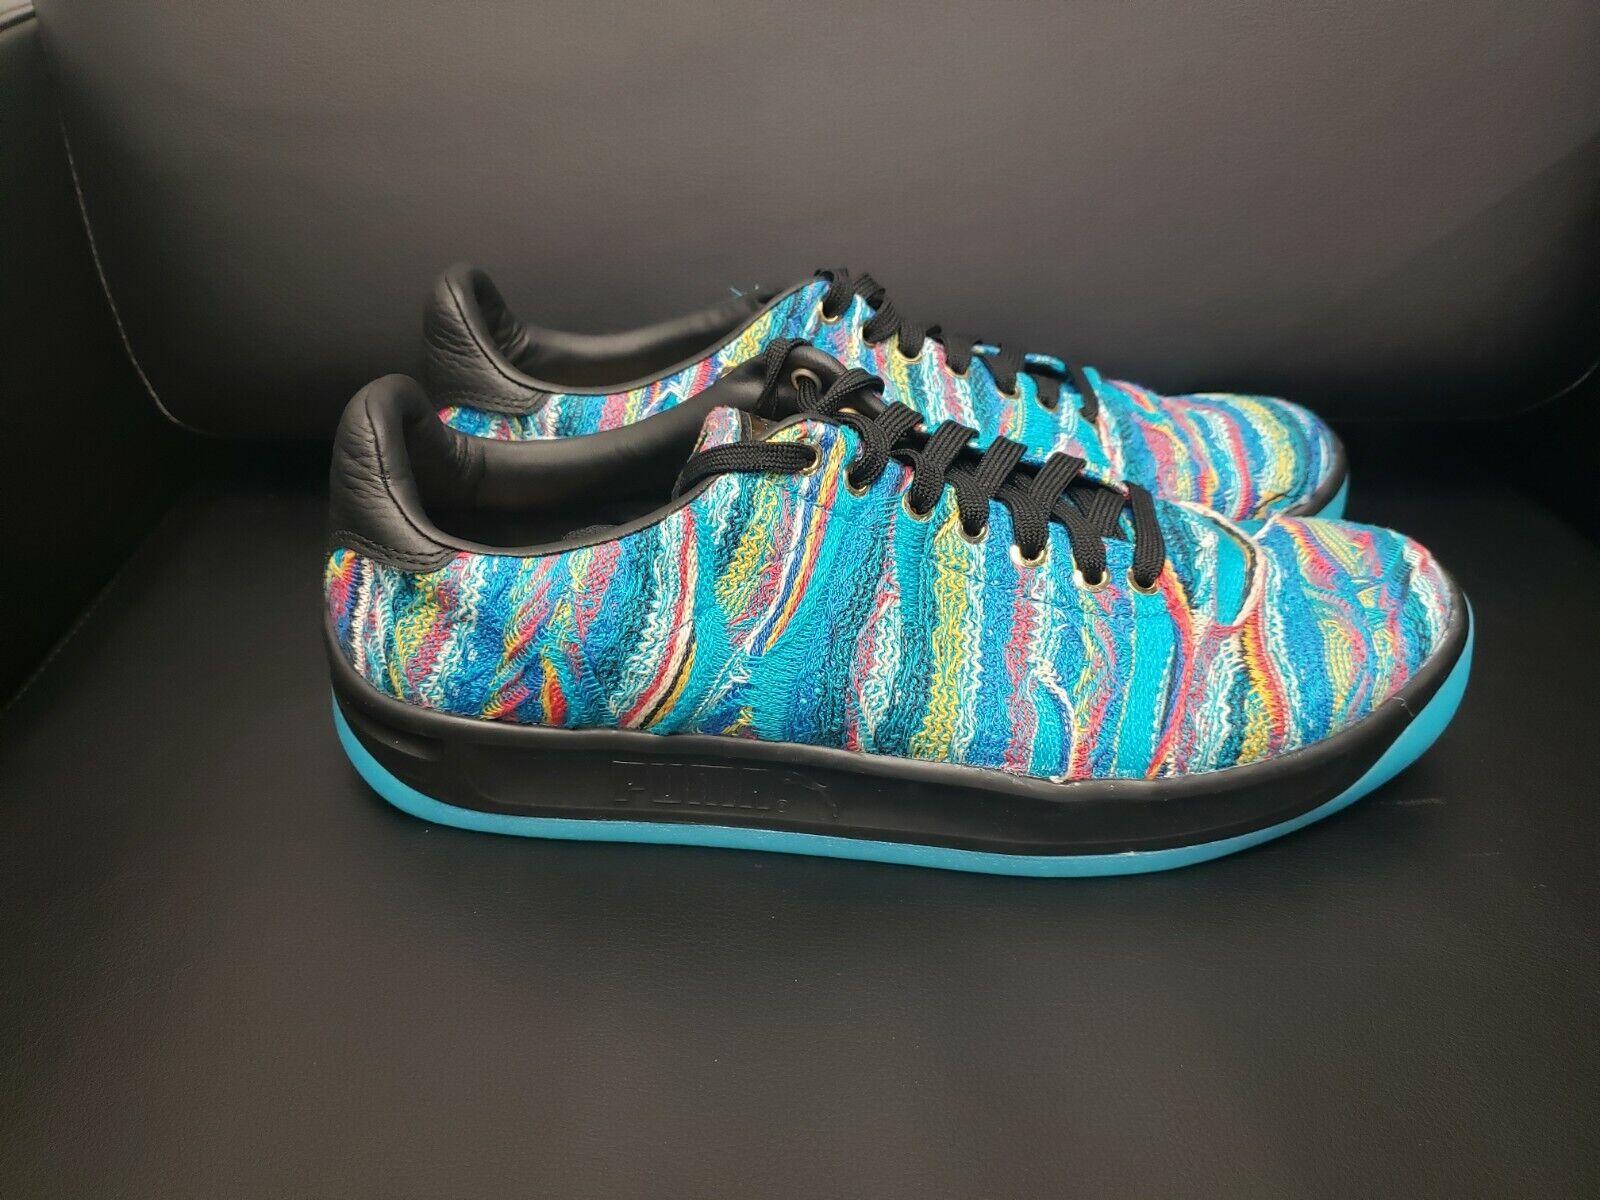 Puma California  COOGI  Multi-color Men's bluee Textile Sneakers SZ 11 36797301